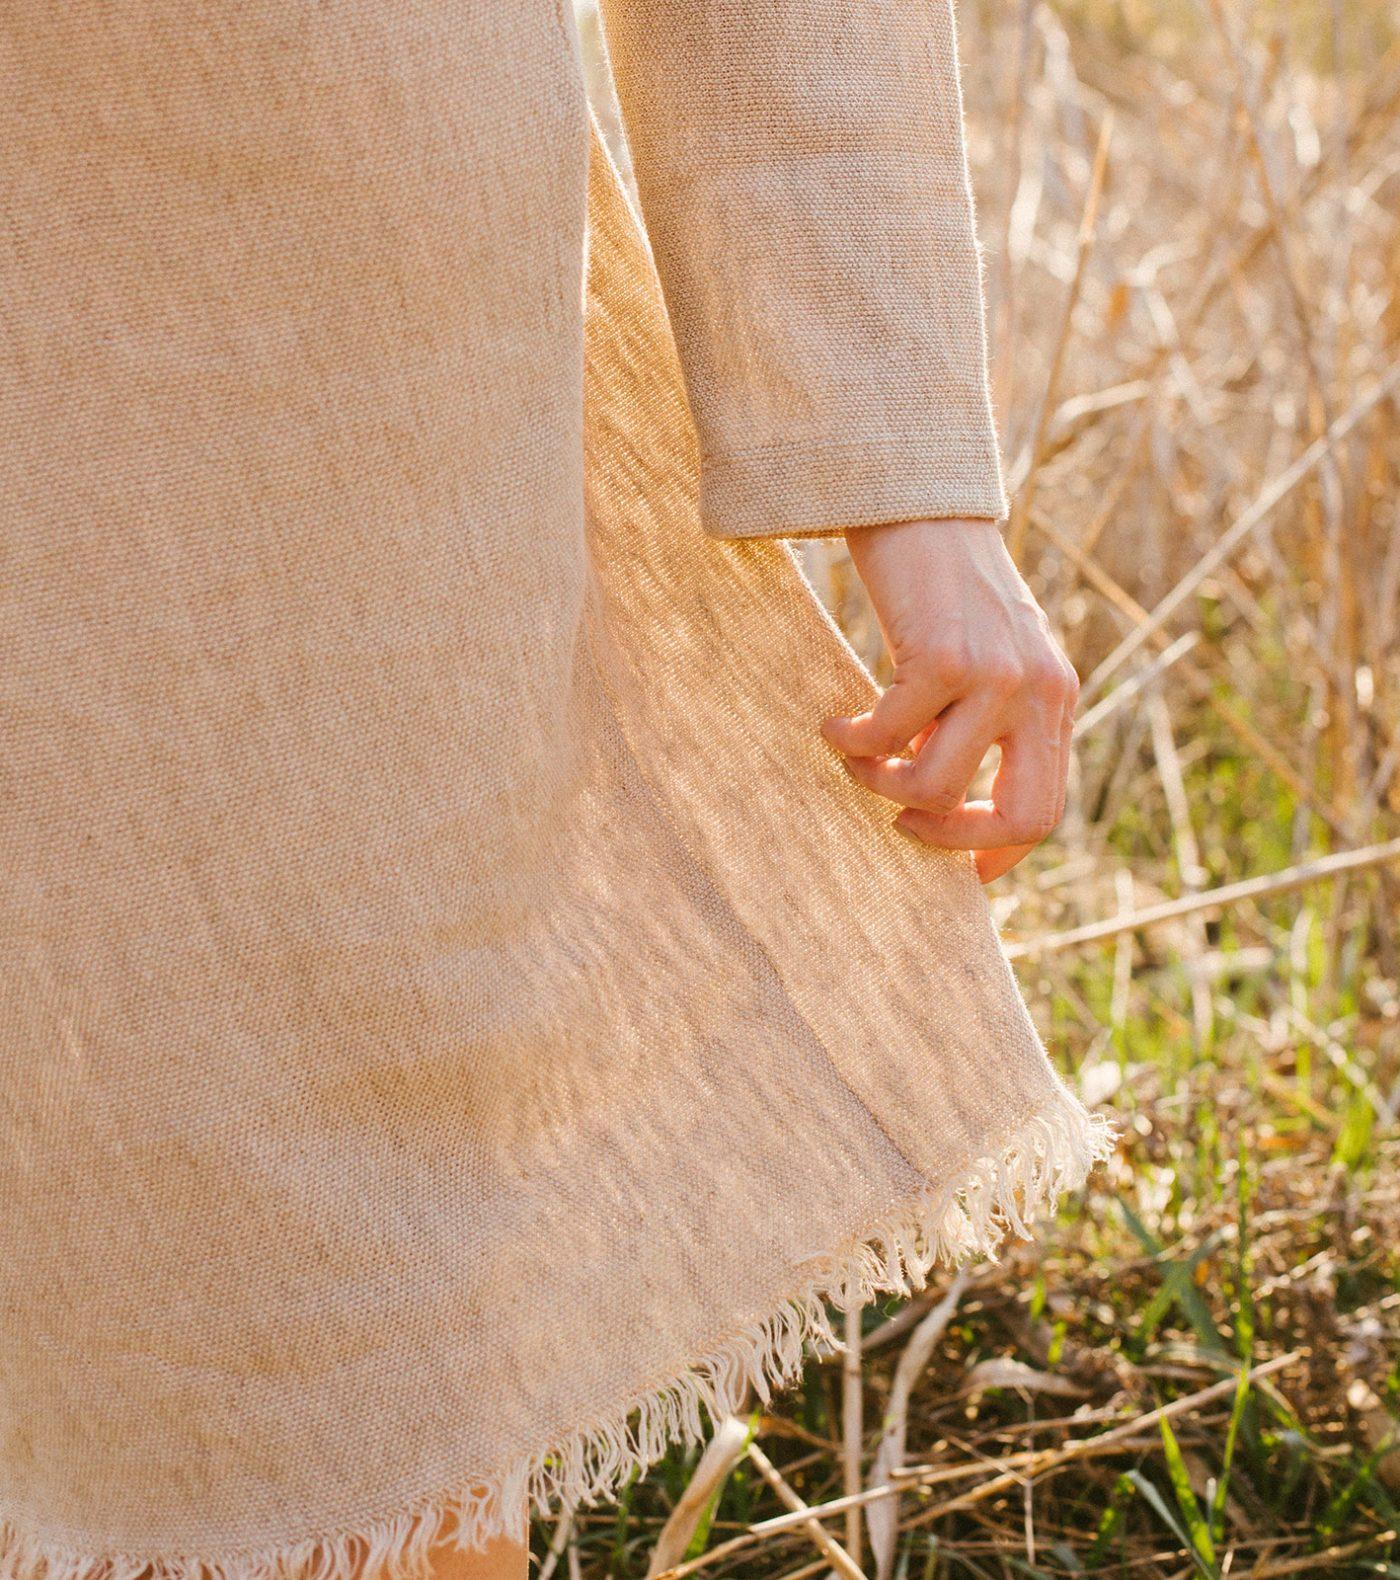 Rochie femei design minimalist comod sustenabil confortabila bumbac